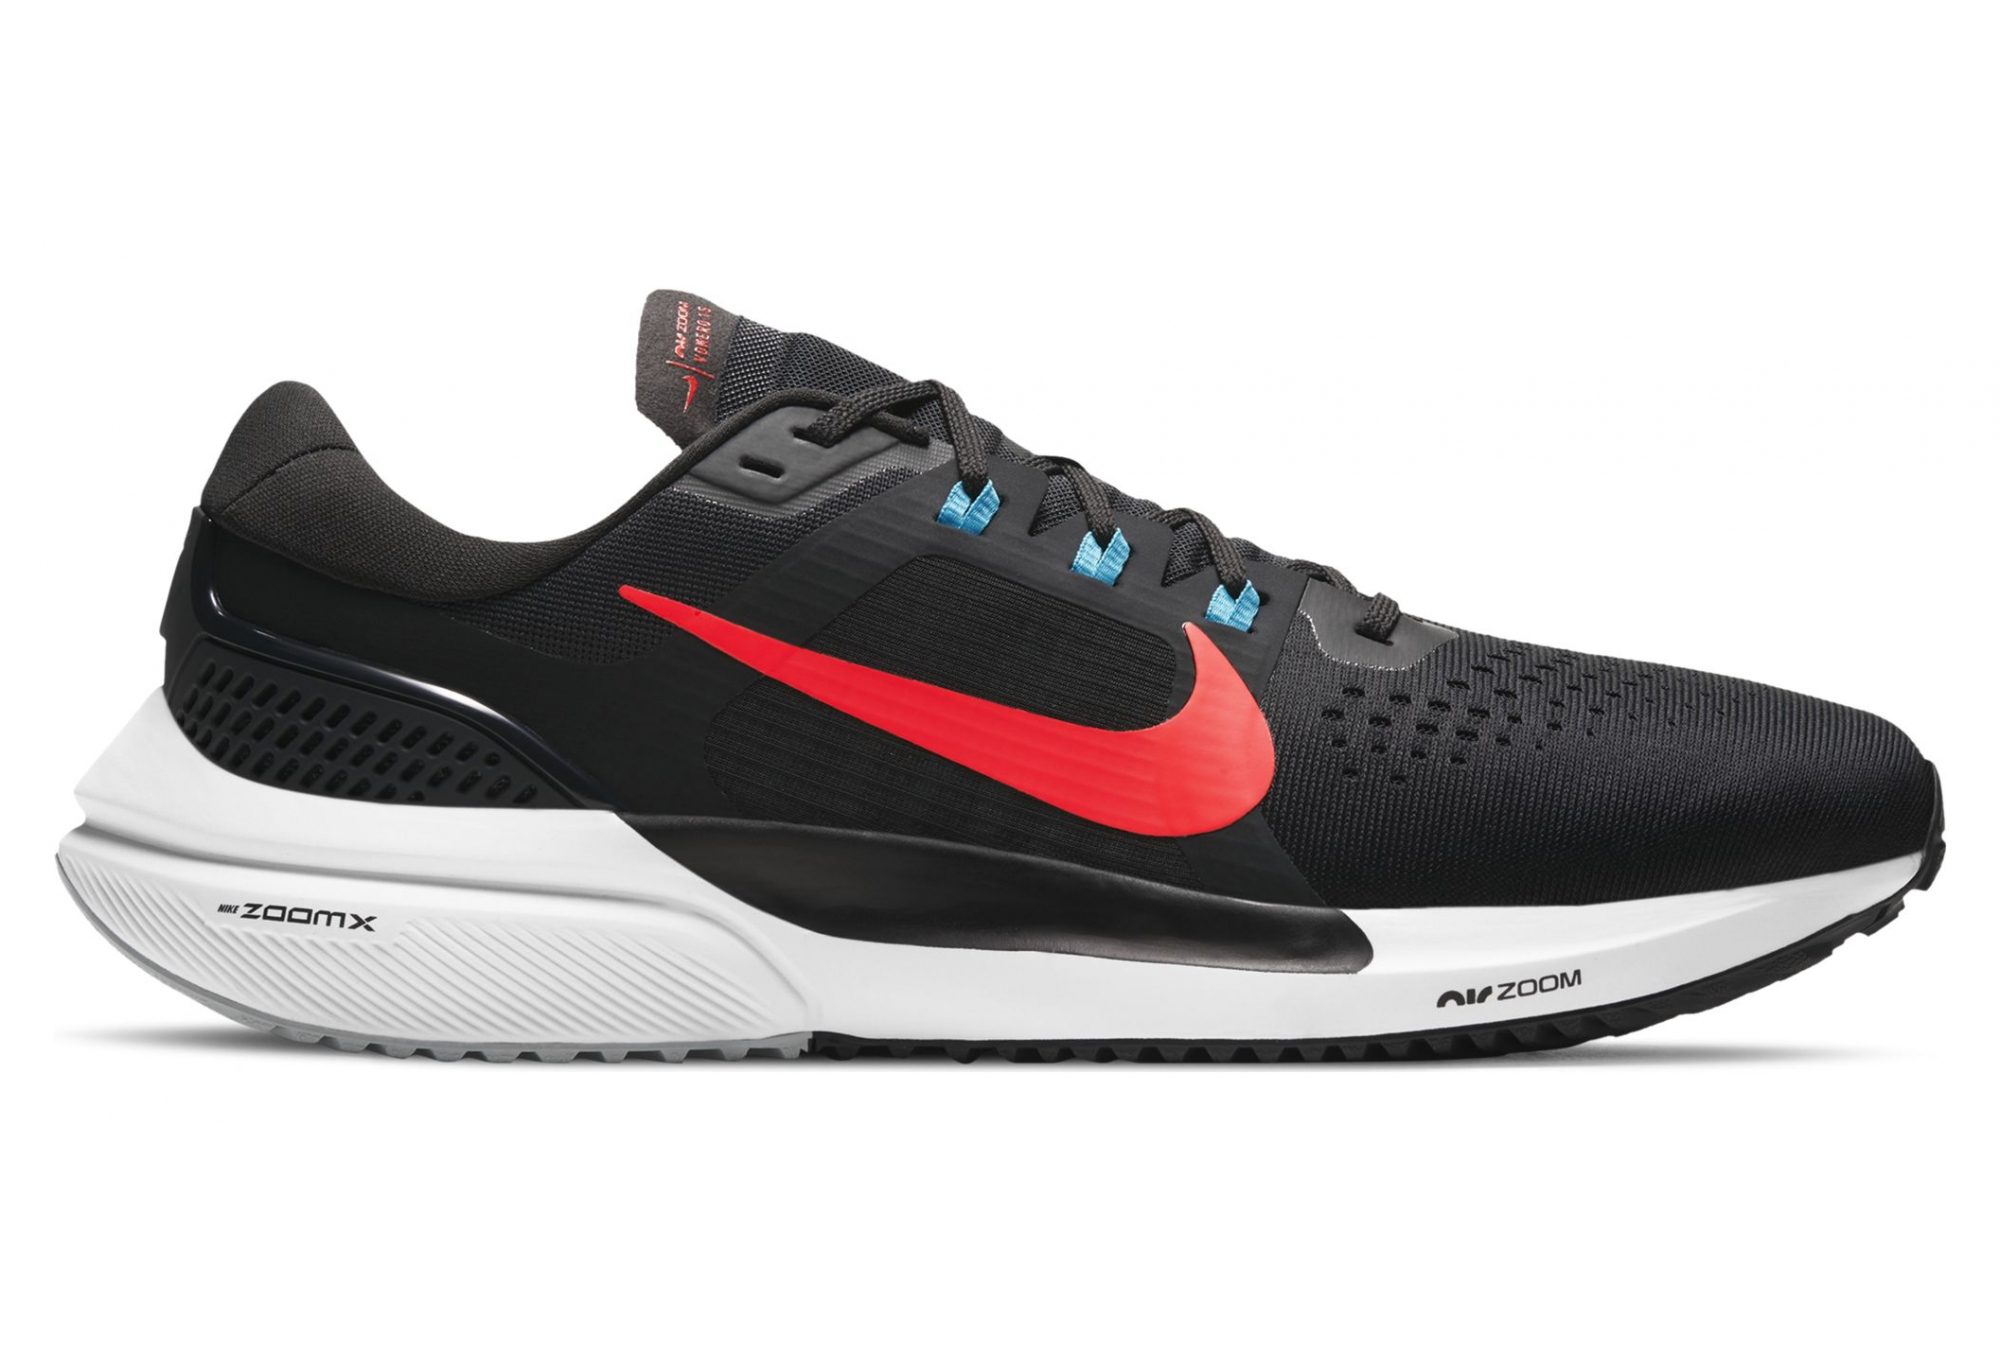 girar Rama escritura  Nike Air Zoom Vomero 15 Negro Rojo Hombre Zapatillas Running | Alltricks.es